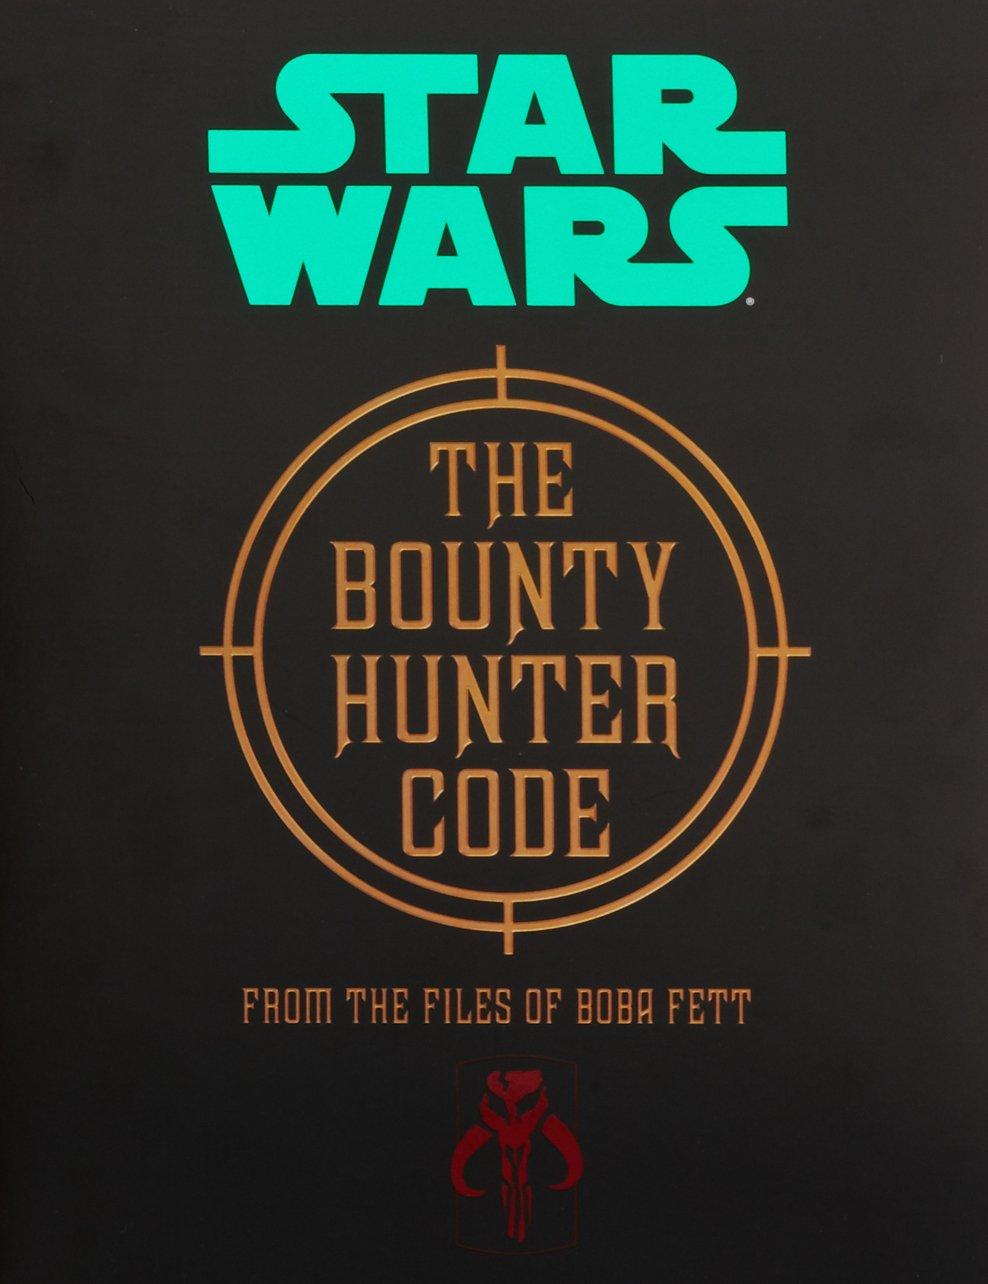 The Bounty Hunter Code (hardcover reprint)